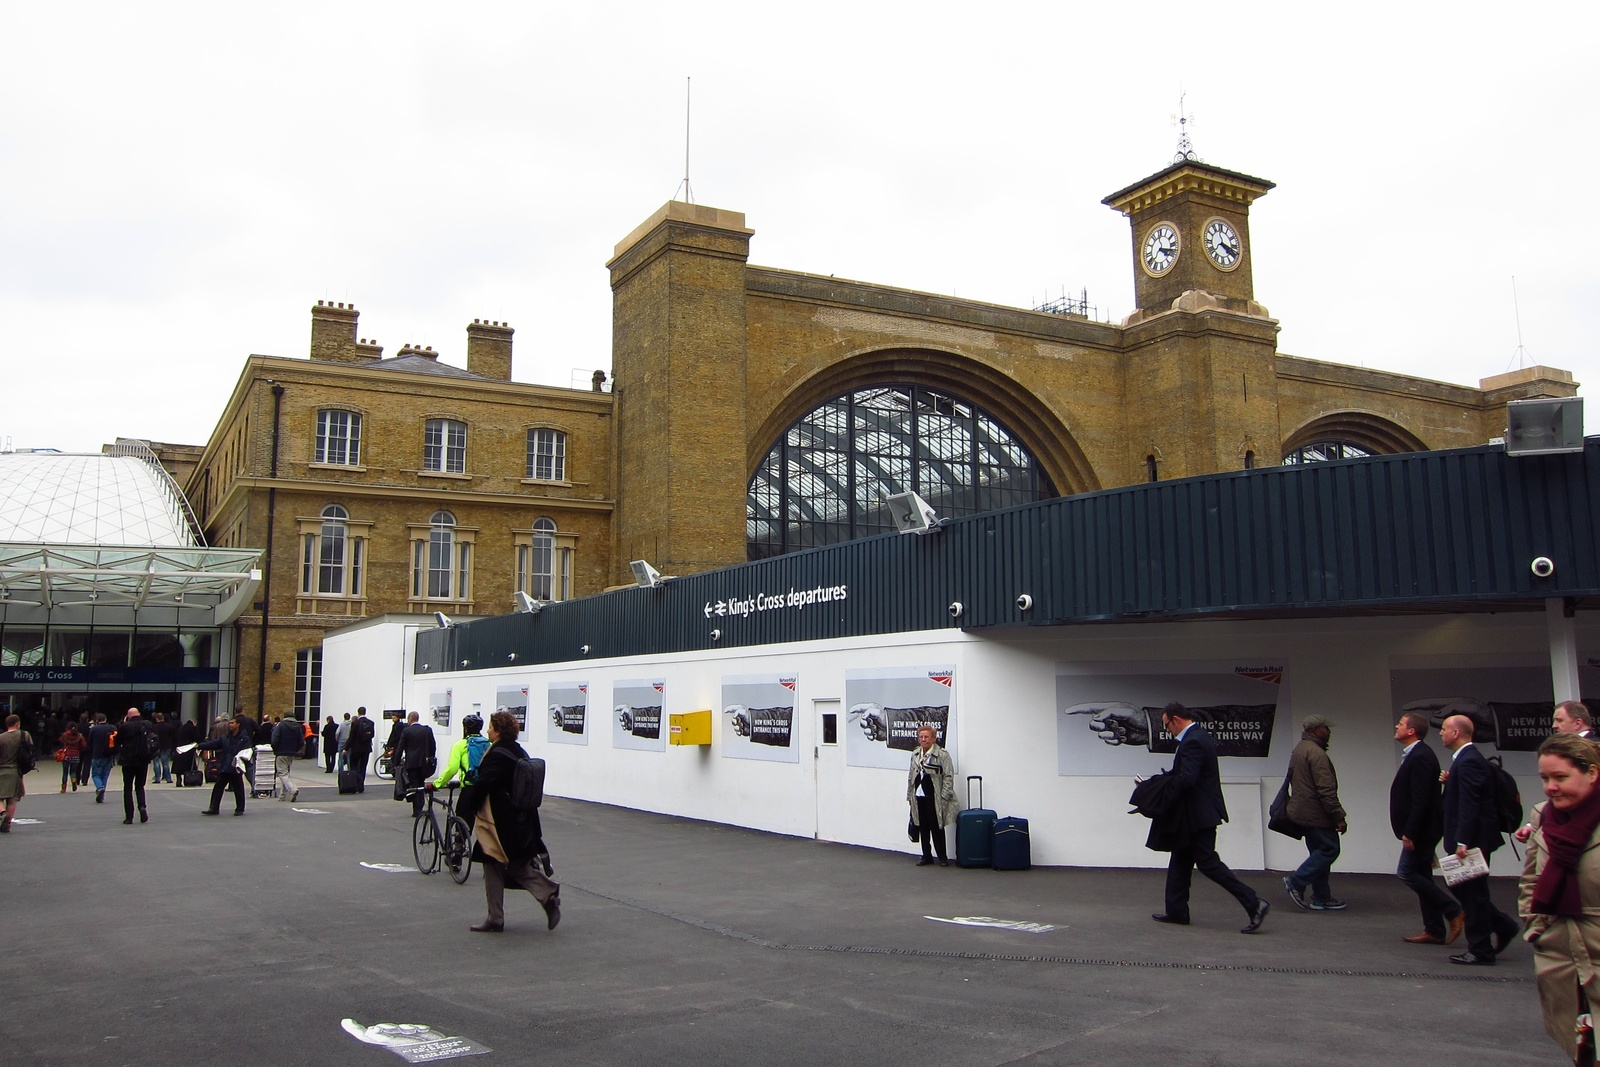 rejs  photos  london  king u0026 39 s cross station